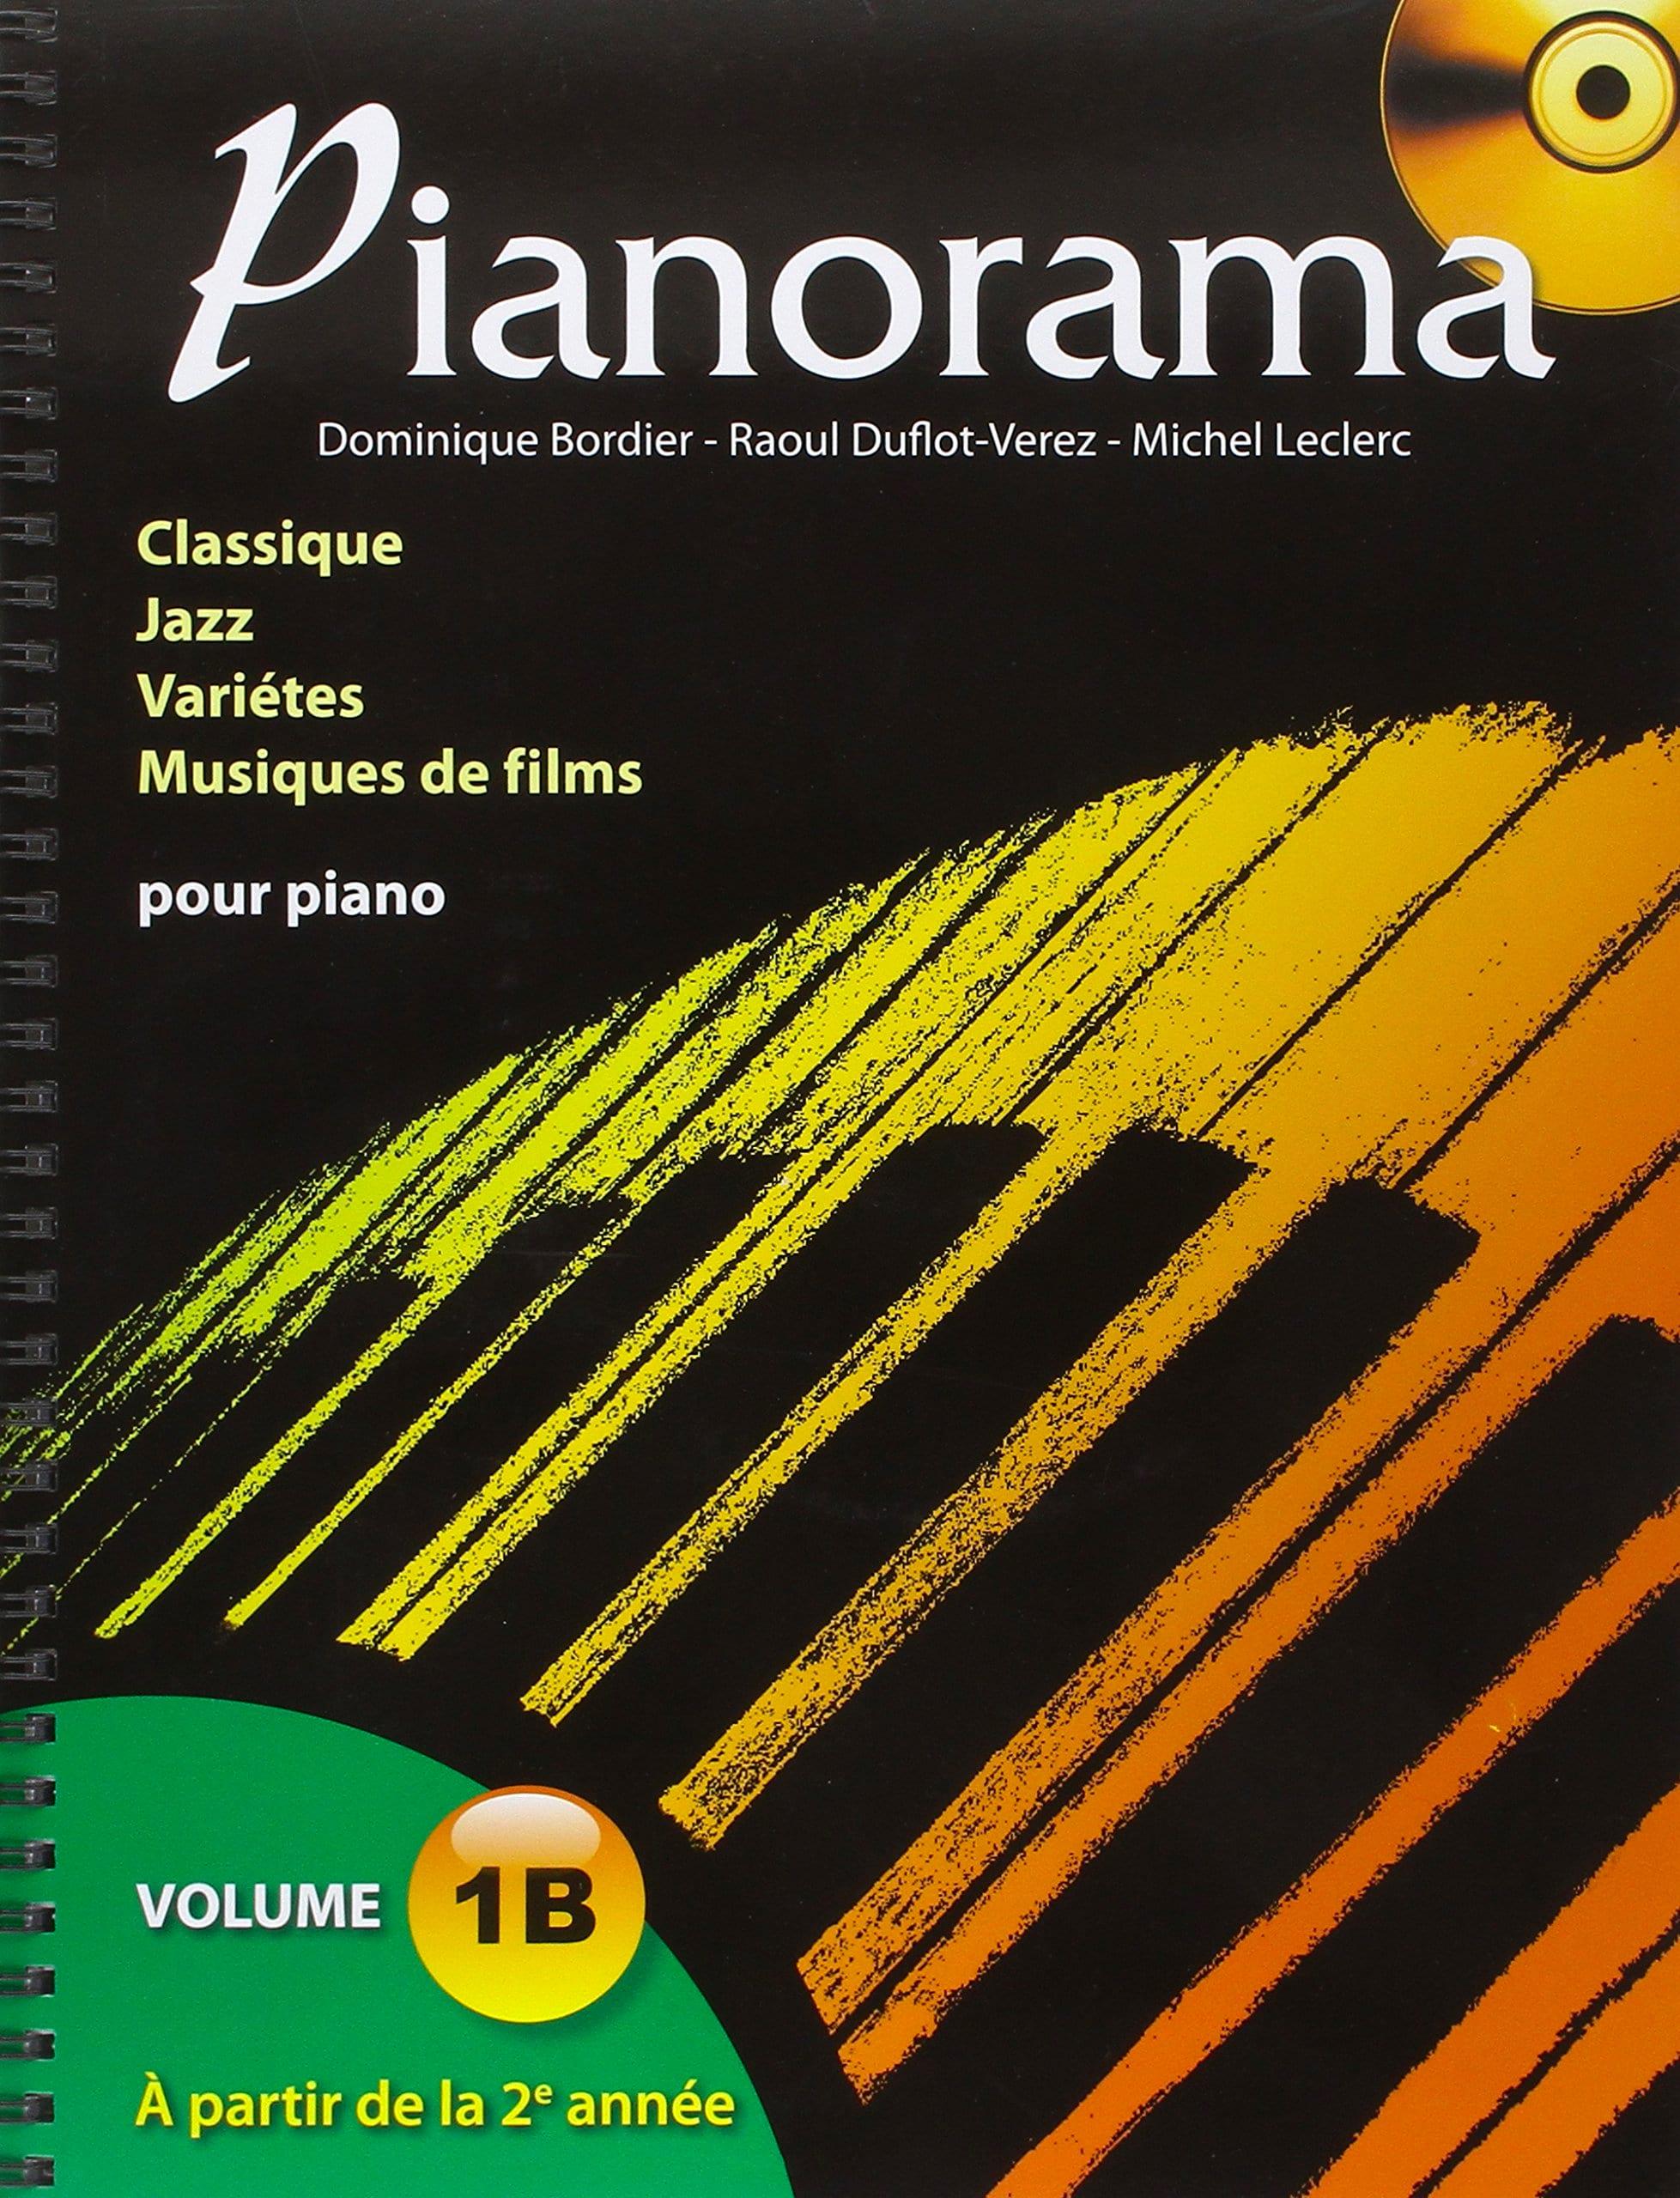 Pianorama 1B - Partition - Piano - laflutedepan.com